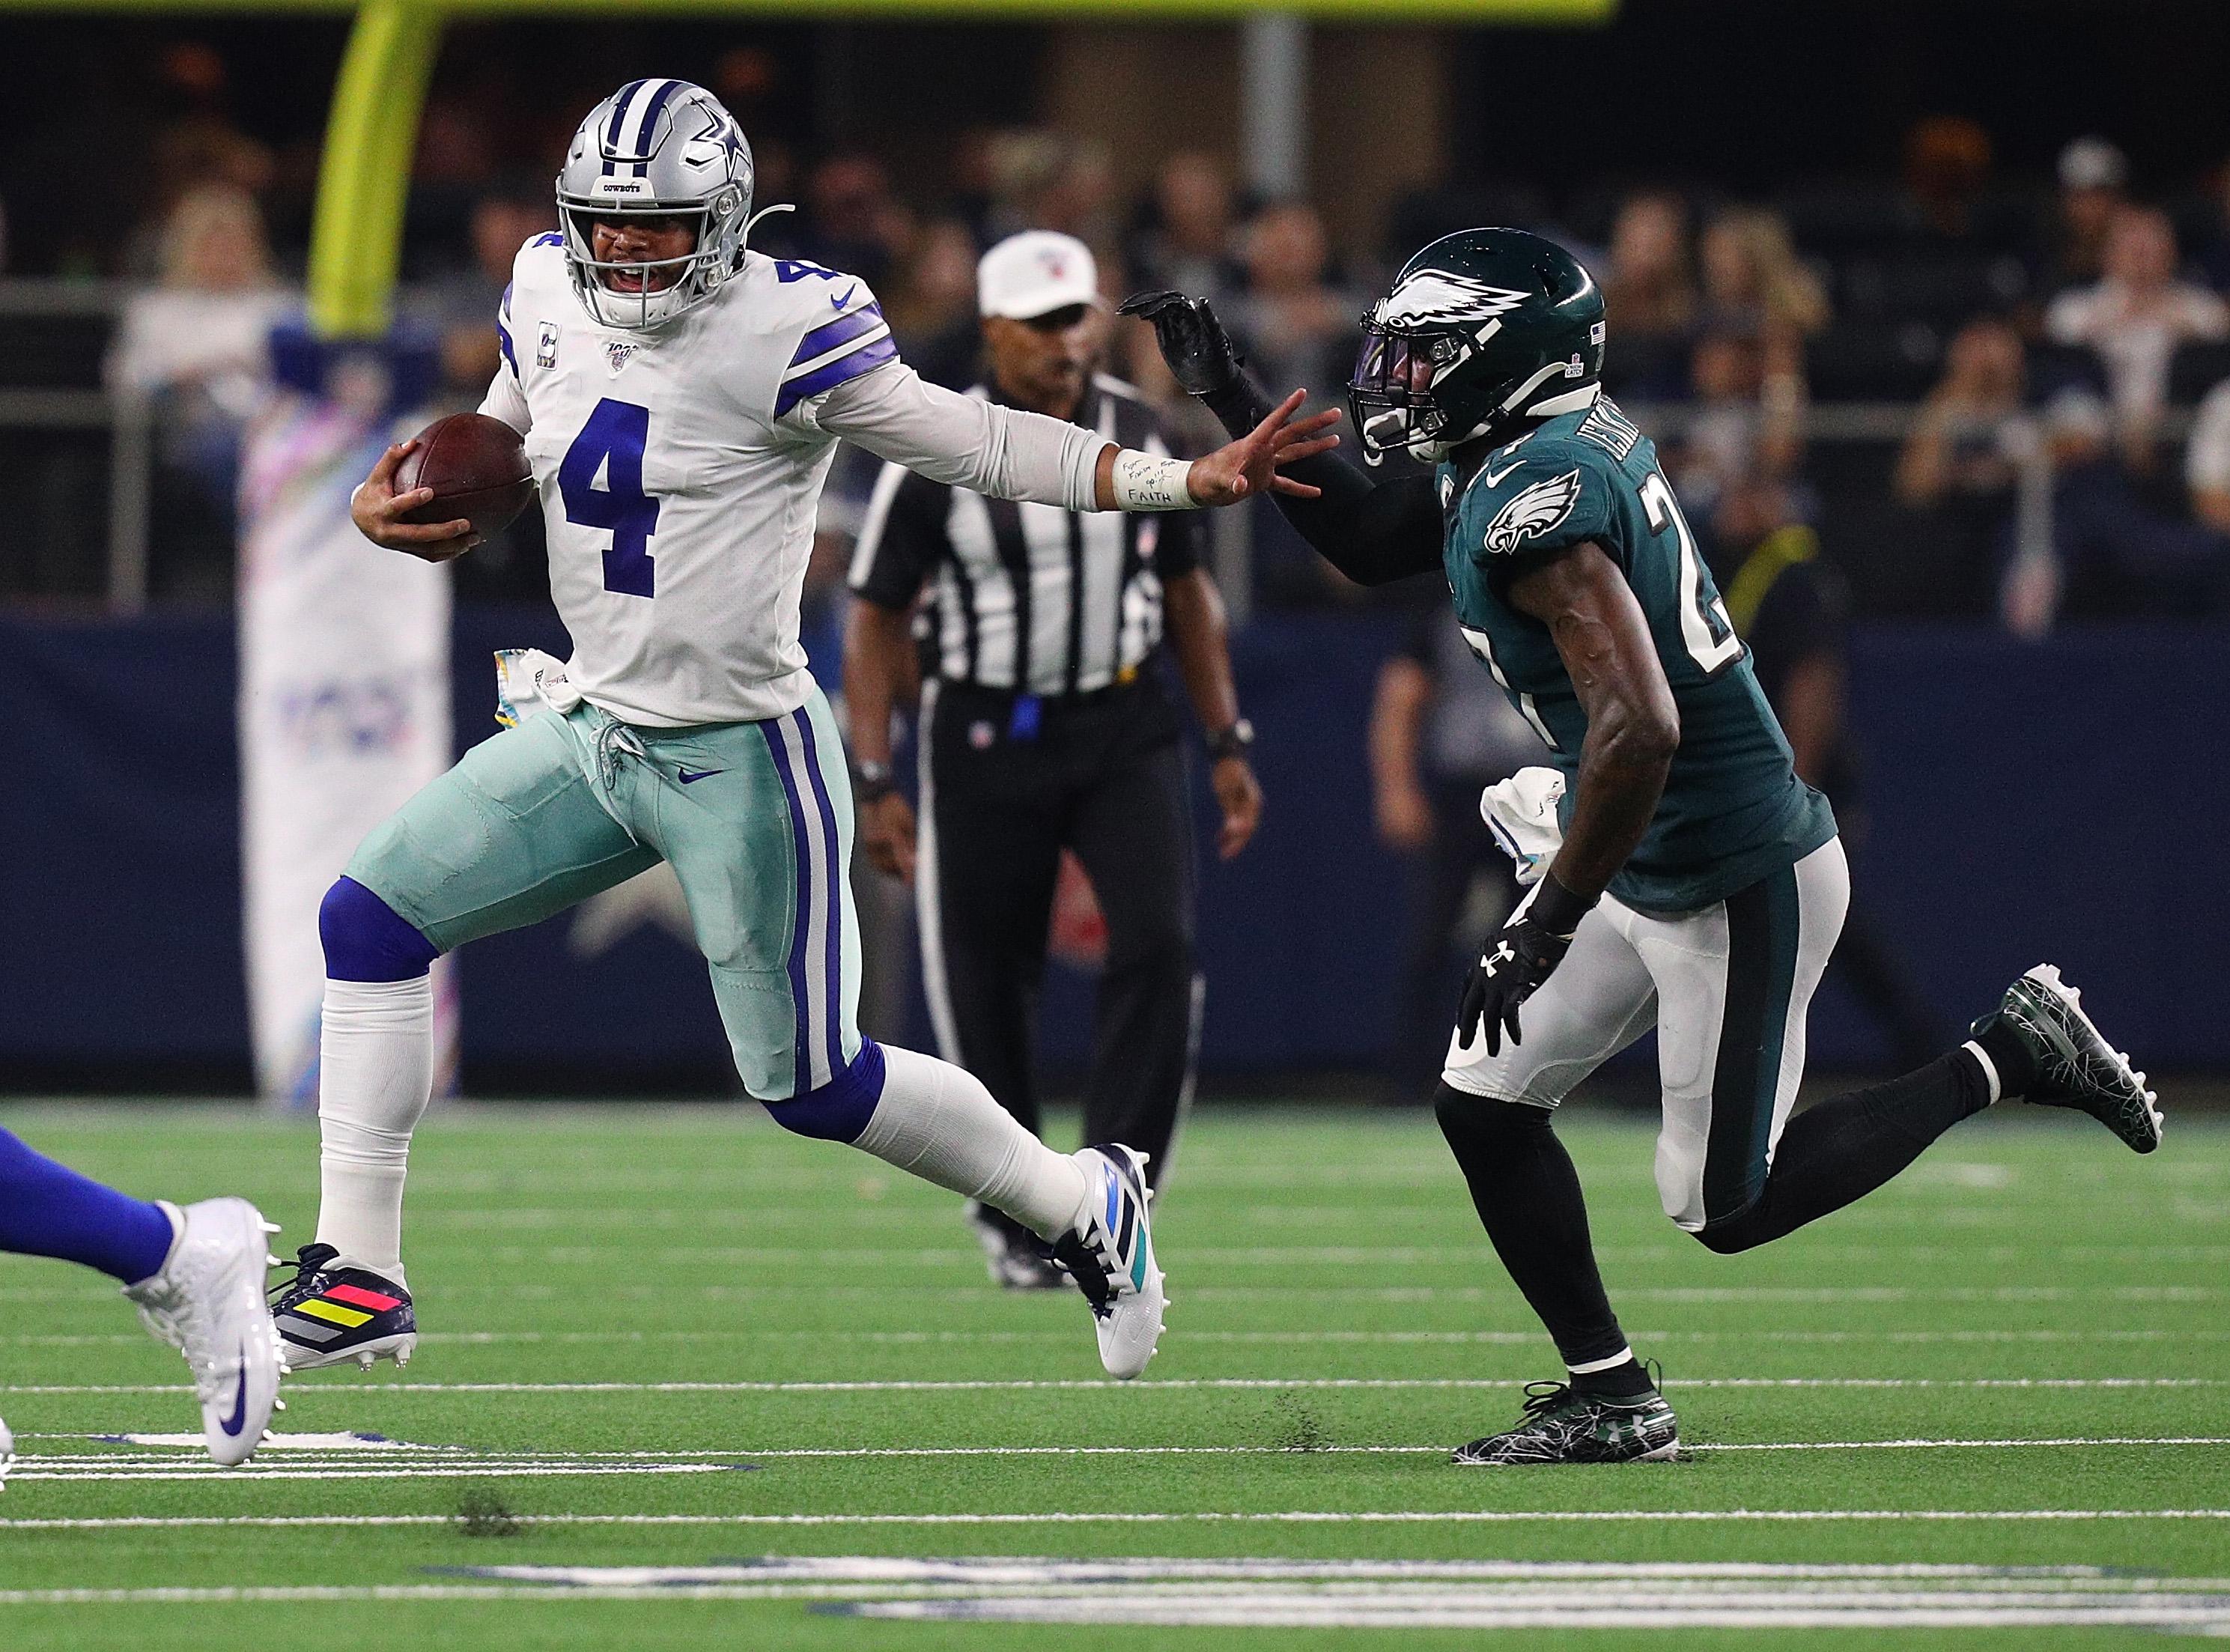 Dallas Cowboys QB Dak Prescott runs away Philadelphia Eagles S Malcolm Jenkins in Week 7, Oct. 20, 2019.